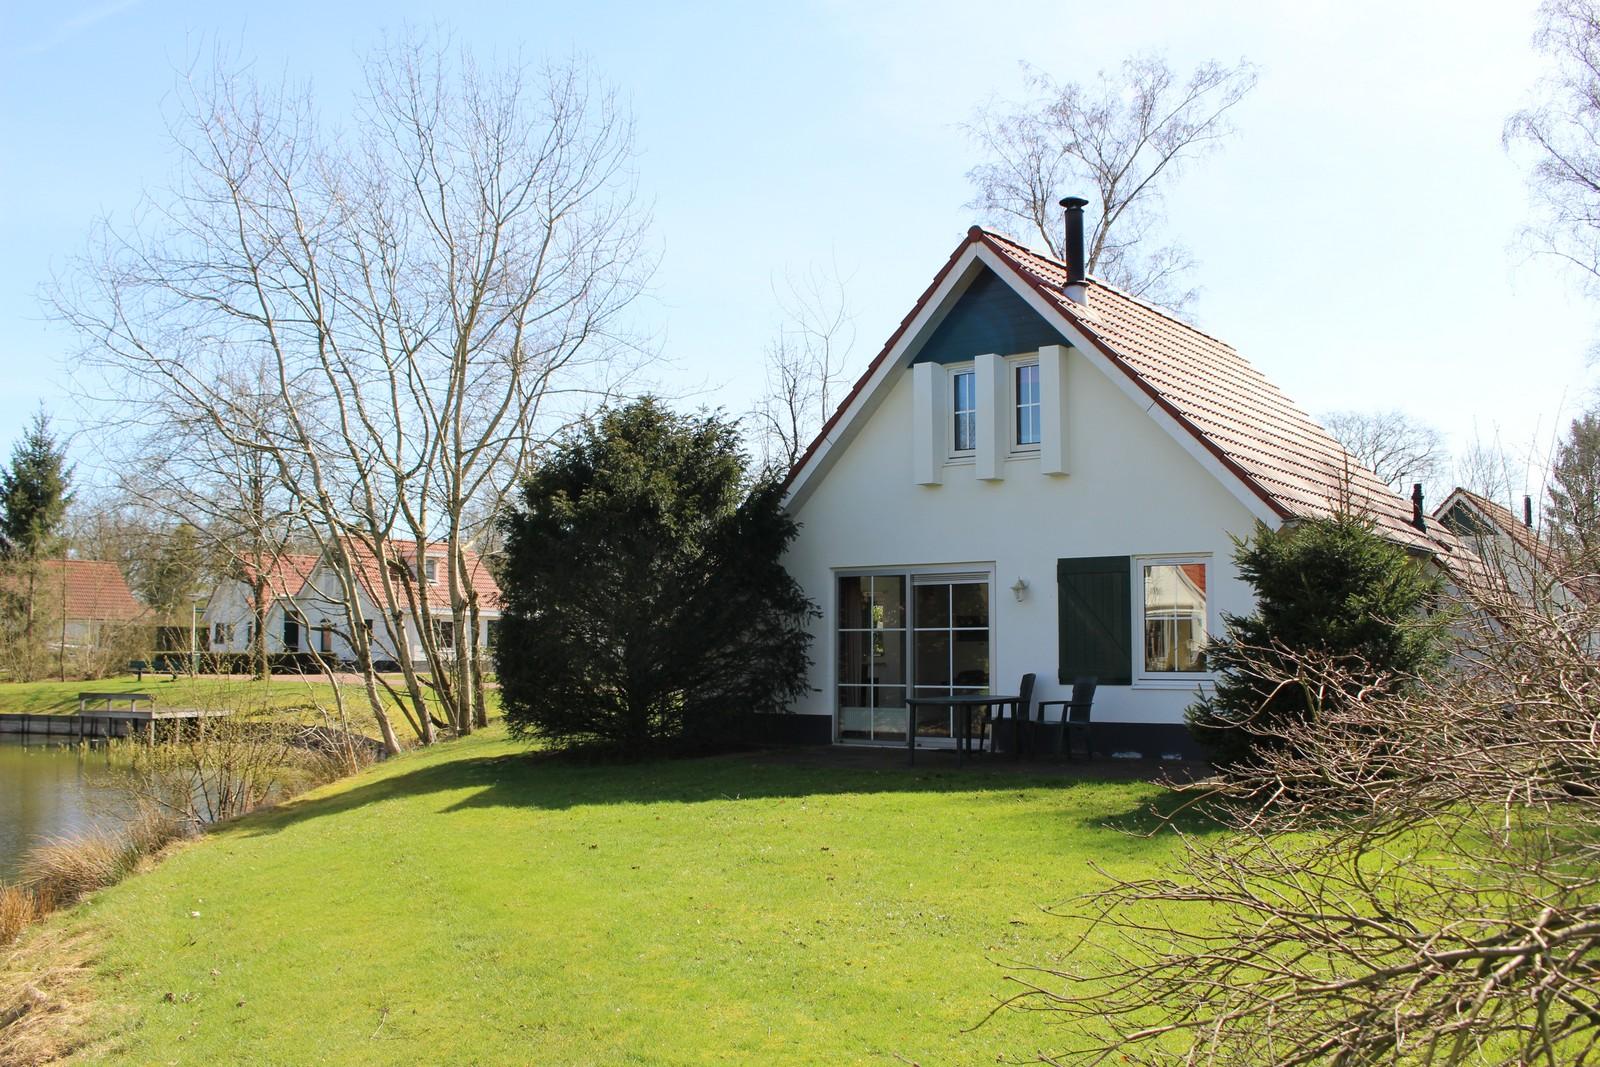 Landal Landgoed De Elsgraven Recreatiewoning nr. 114